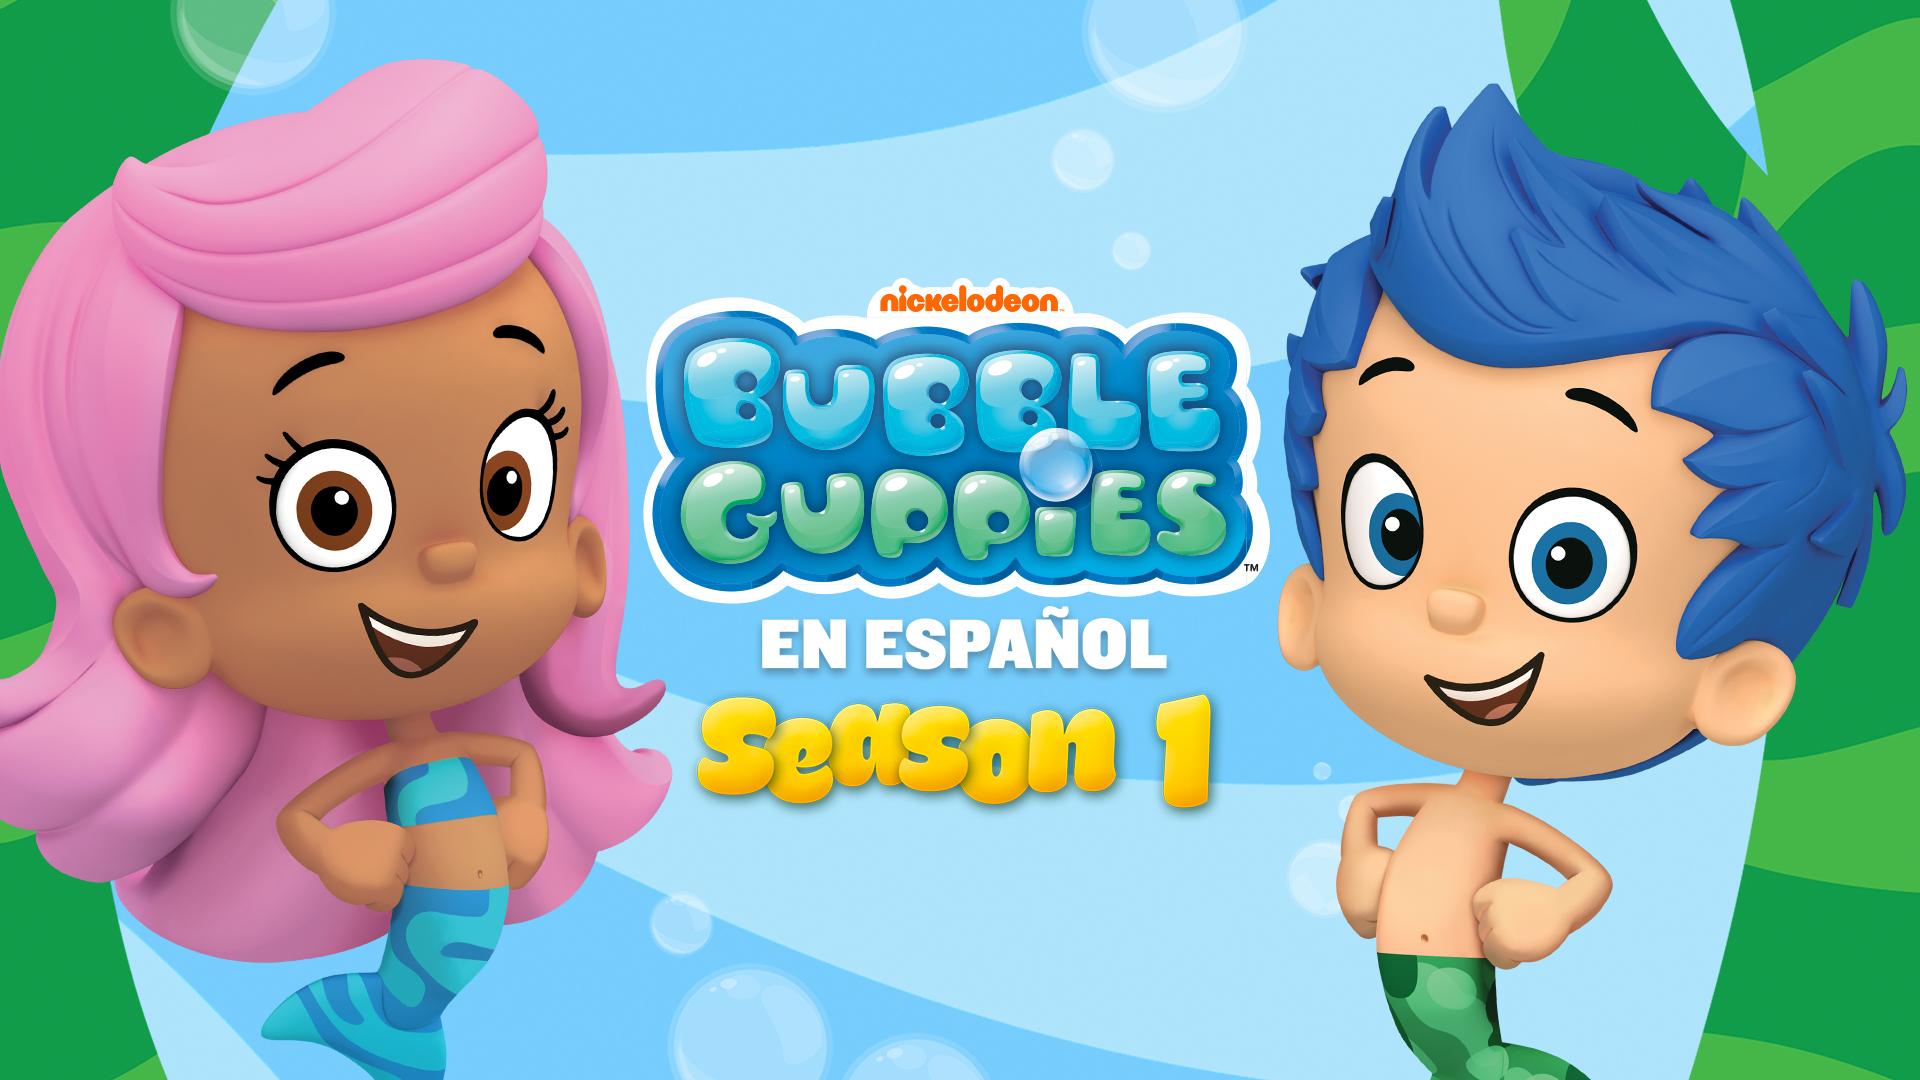 Bubble Guppies en Espanol Season 1